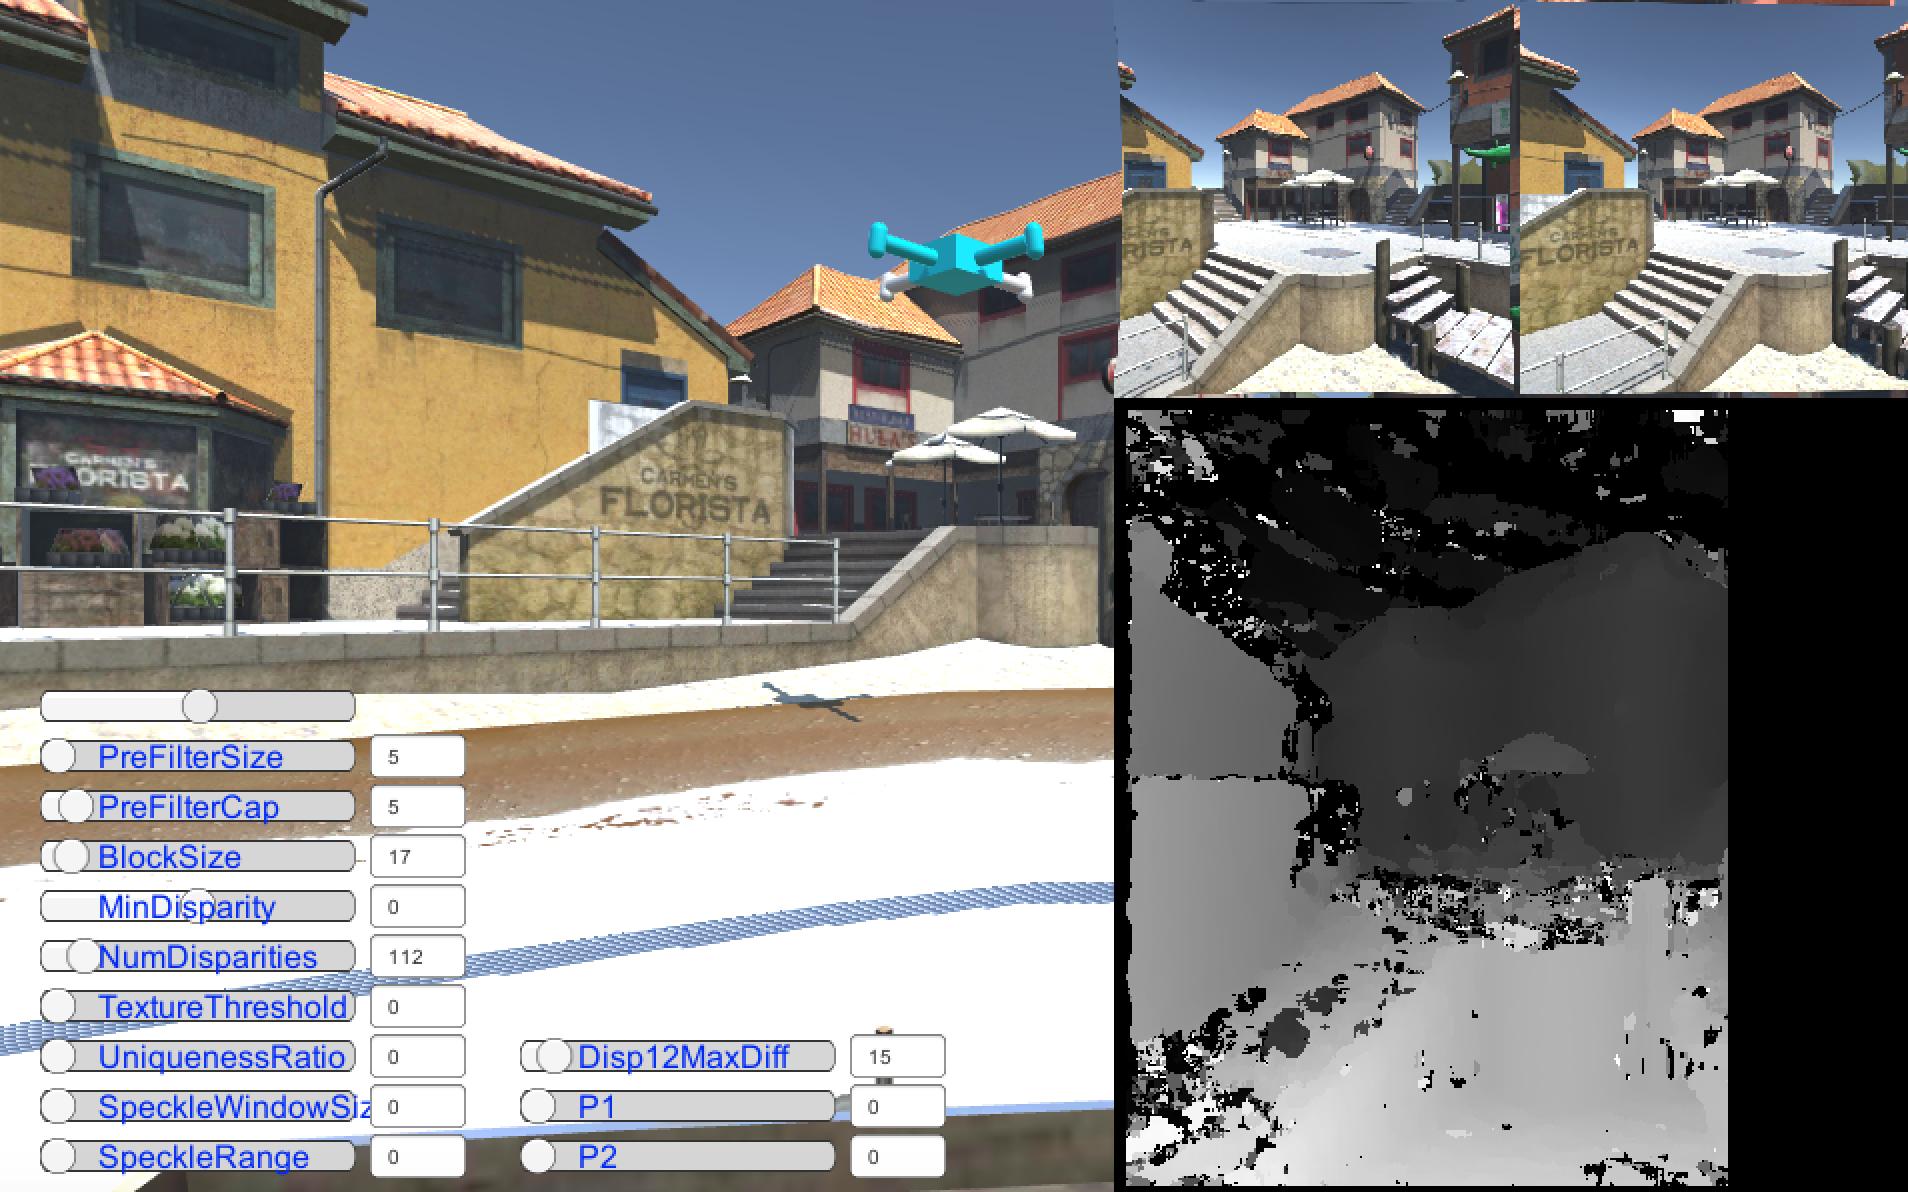 Парсер Хабра: Виртуальный квадрокоптер на Unity + OpenCV (Часть 3)